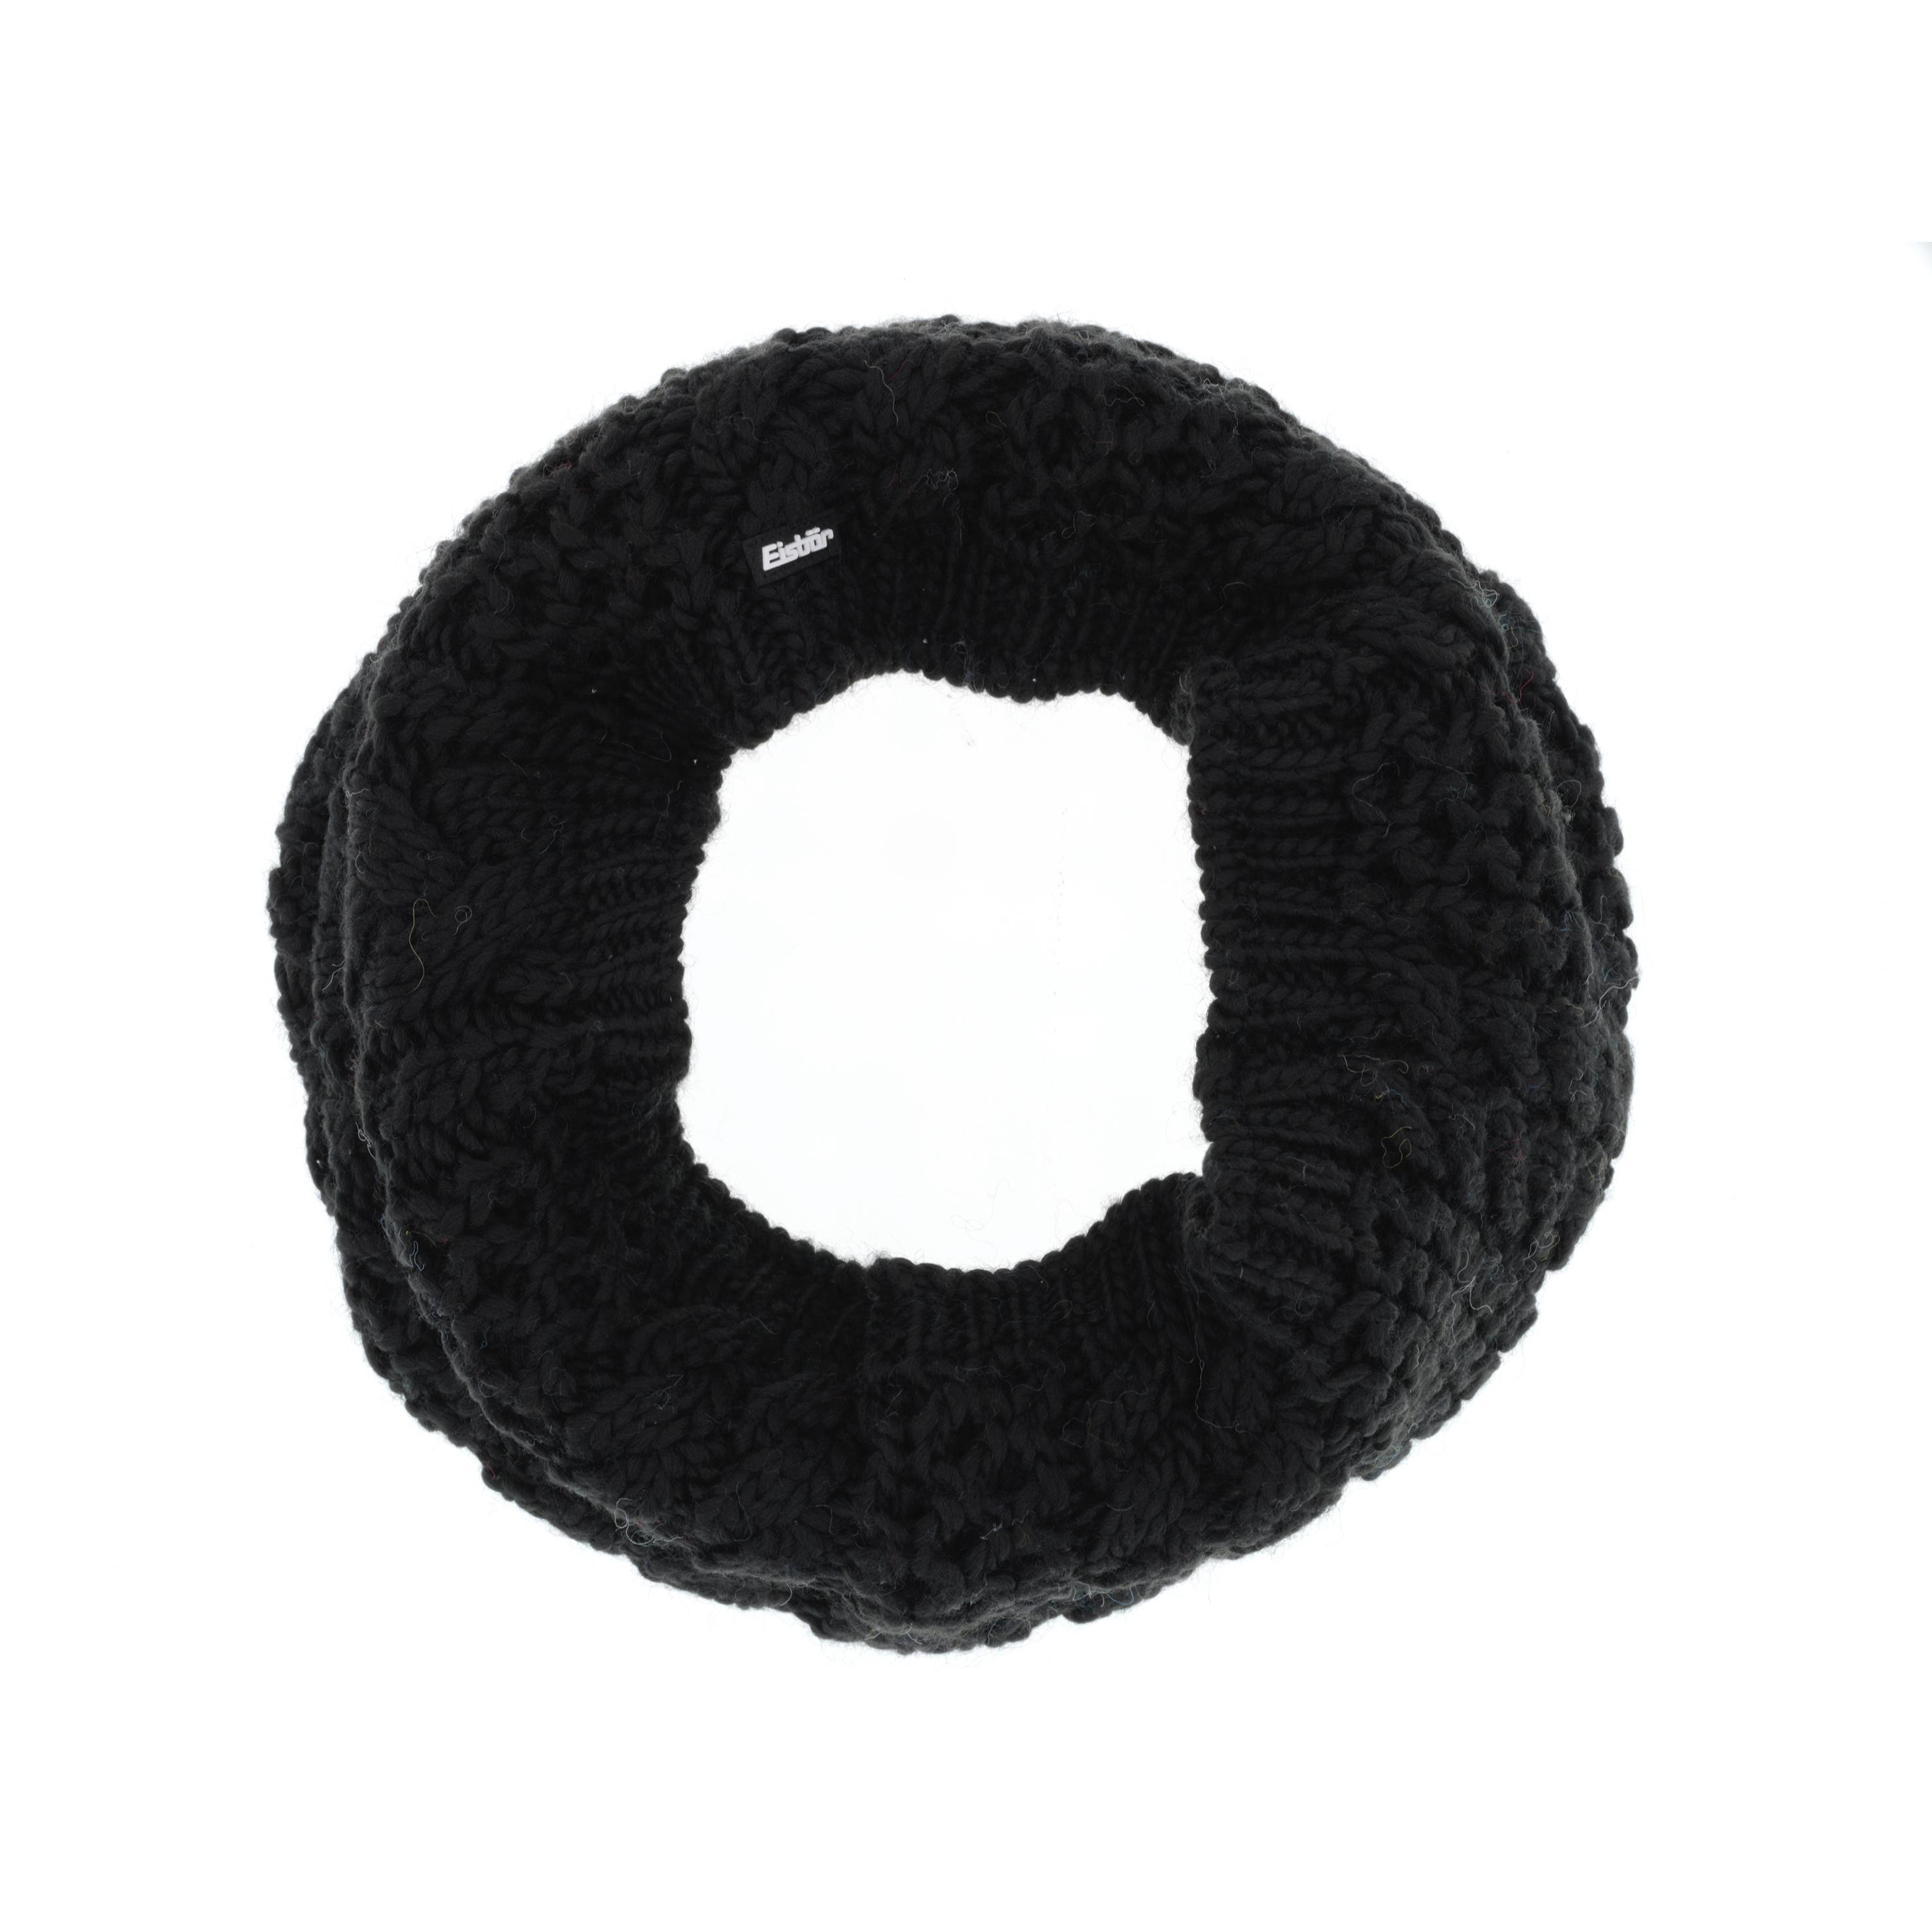 Шарф Alfa Loop Черный Eisbär — фото 1